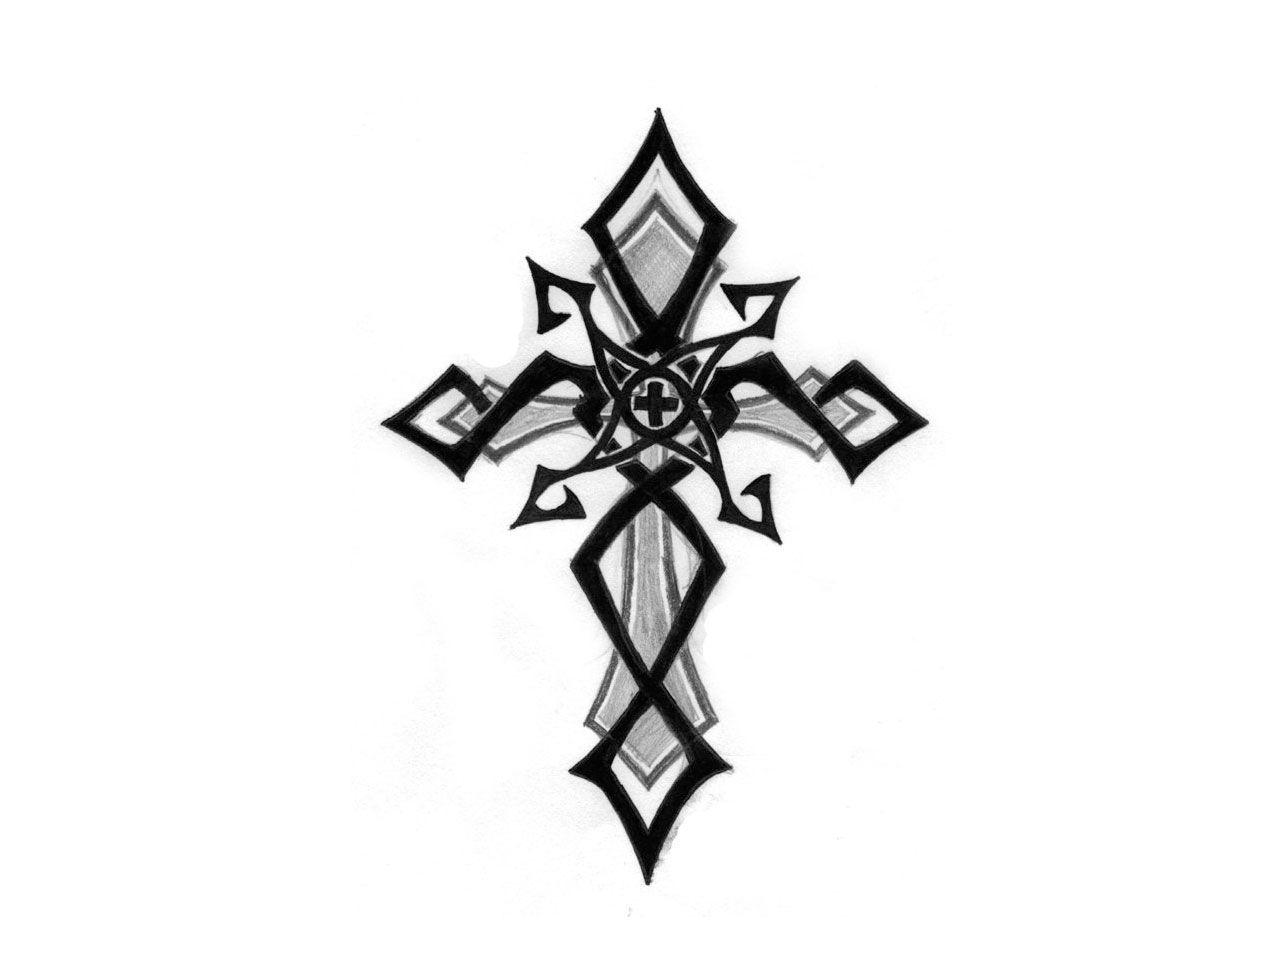 small tribal tattoos free designs penciled tribal cross tattoo wallpaper tattoos pinterest. Black Bedroom Furniture Sets. Home Design Ideas